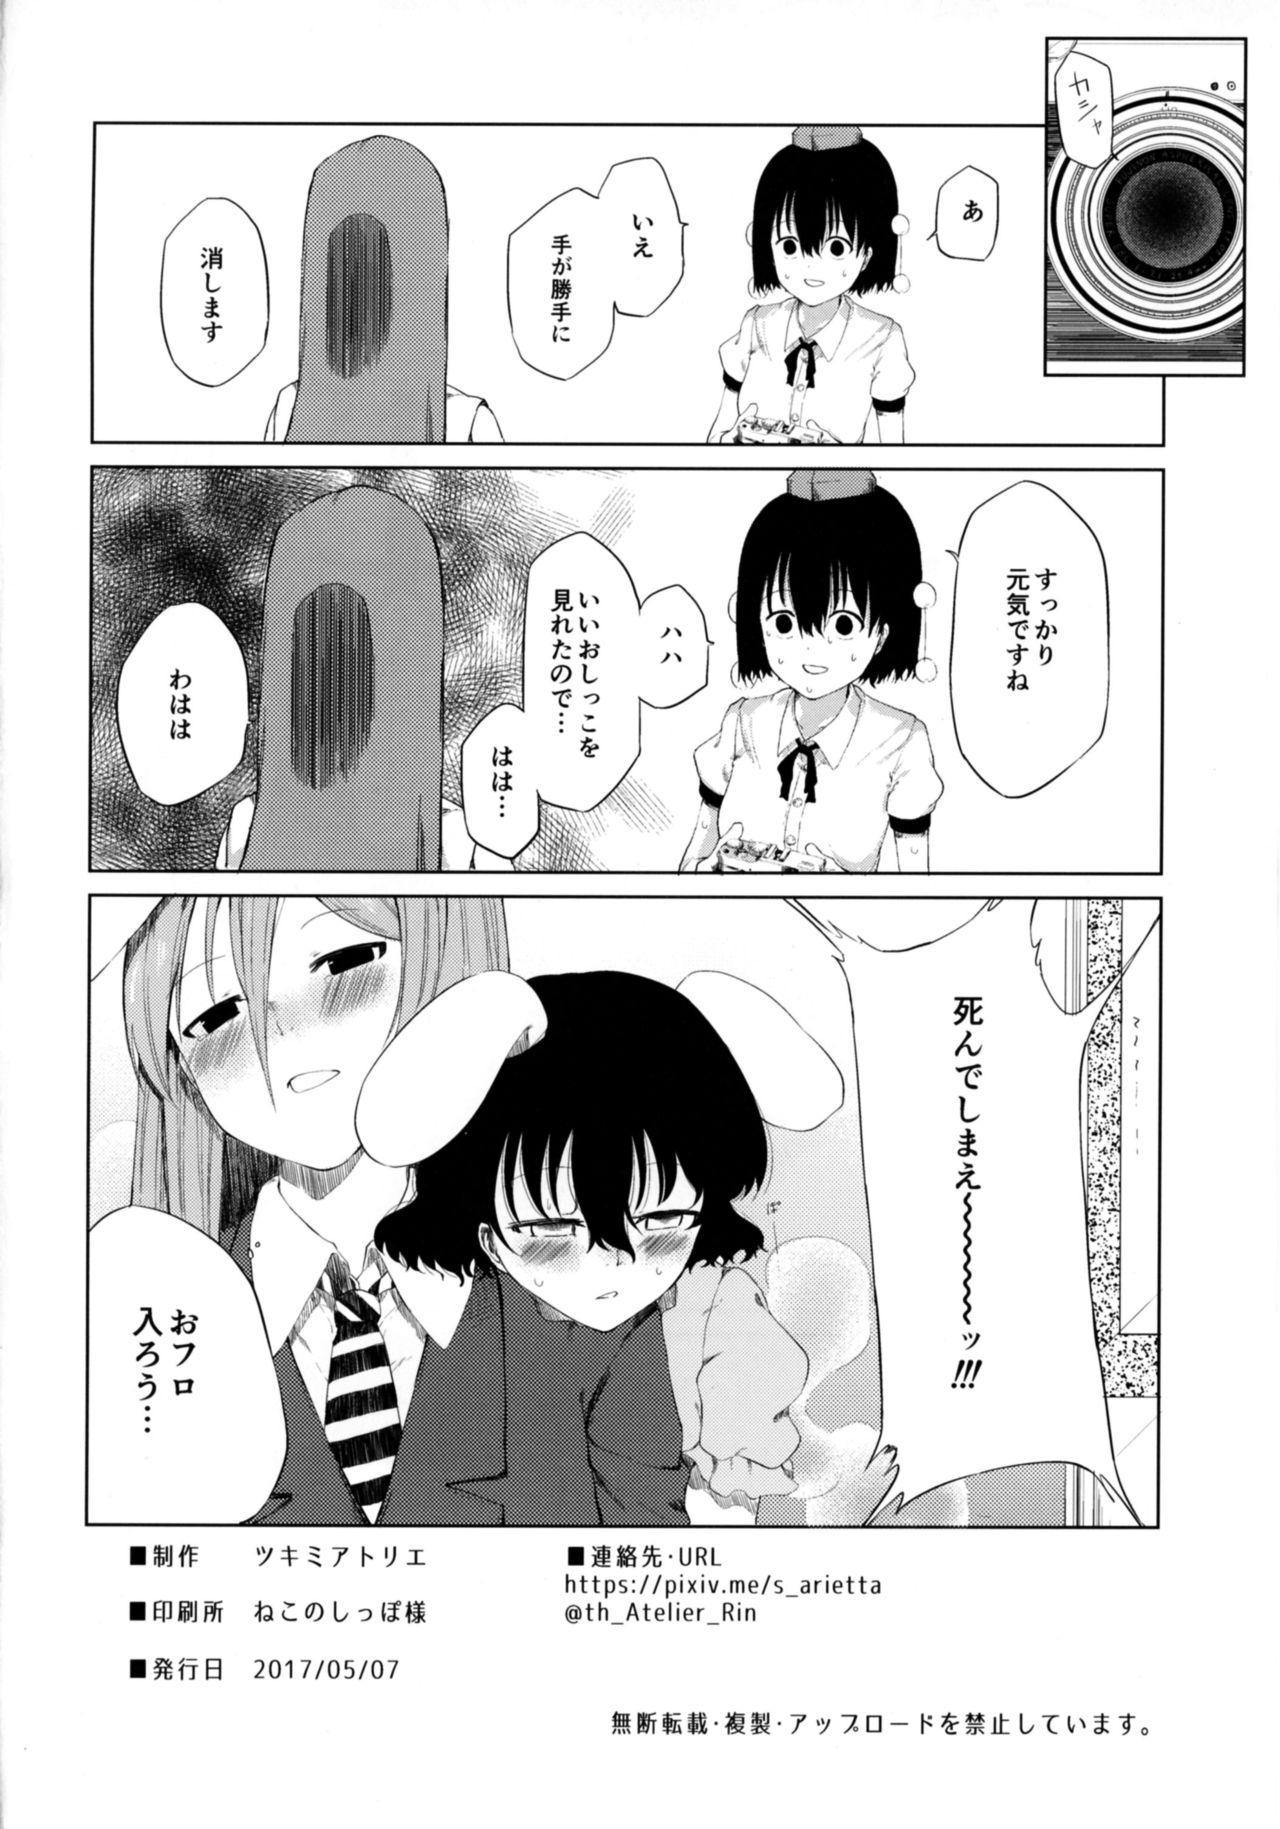 Aya to Tewi to Sanae to Udonge ga Omorashi Suru Hon!! 25